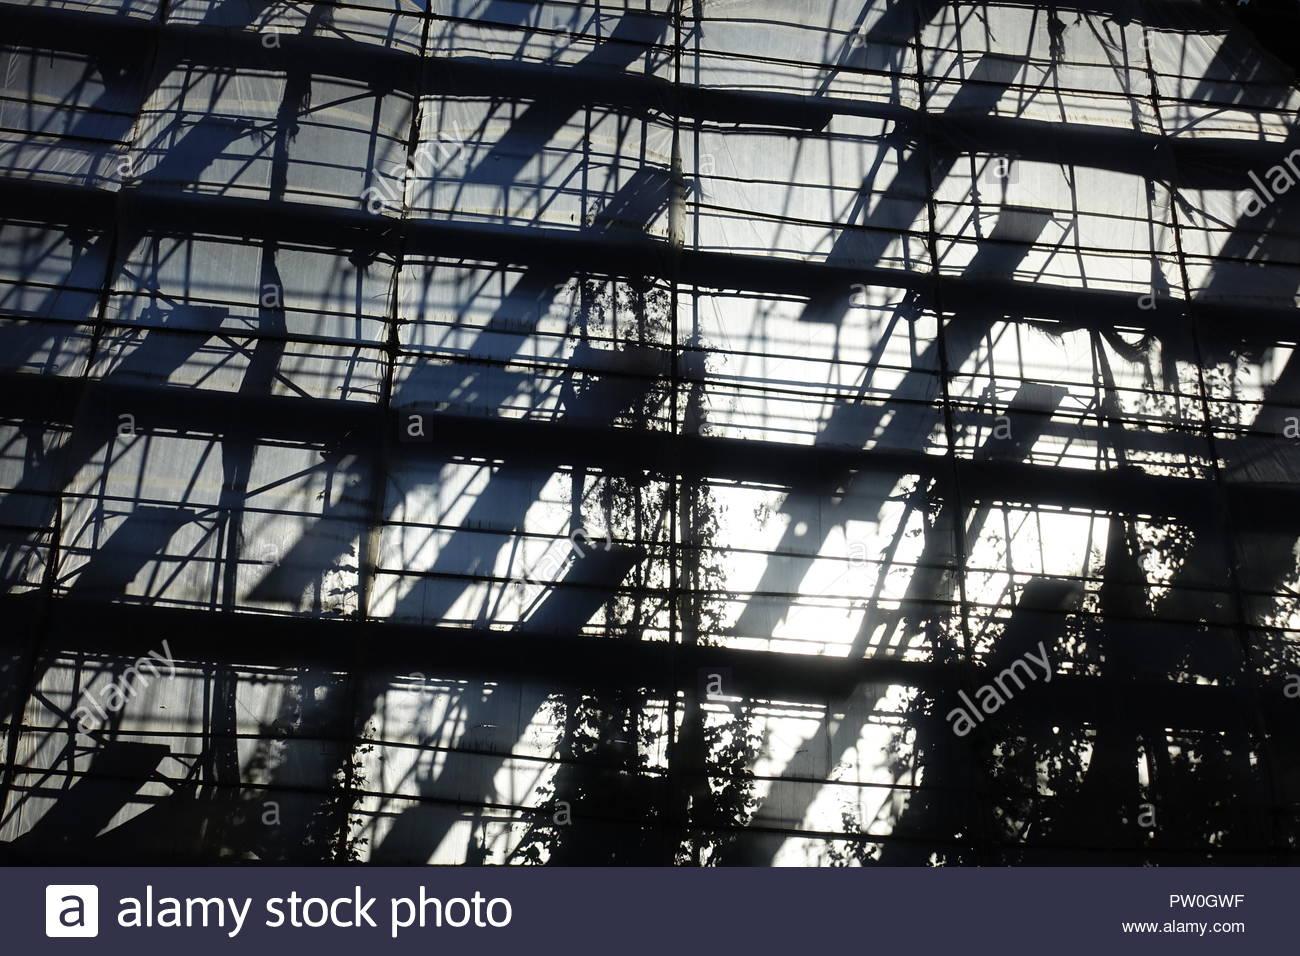 Berlin, Gerüst am Modell der Berliner Bauakademie - Stock Image